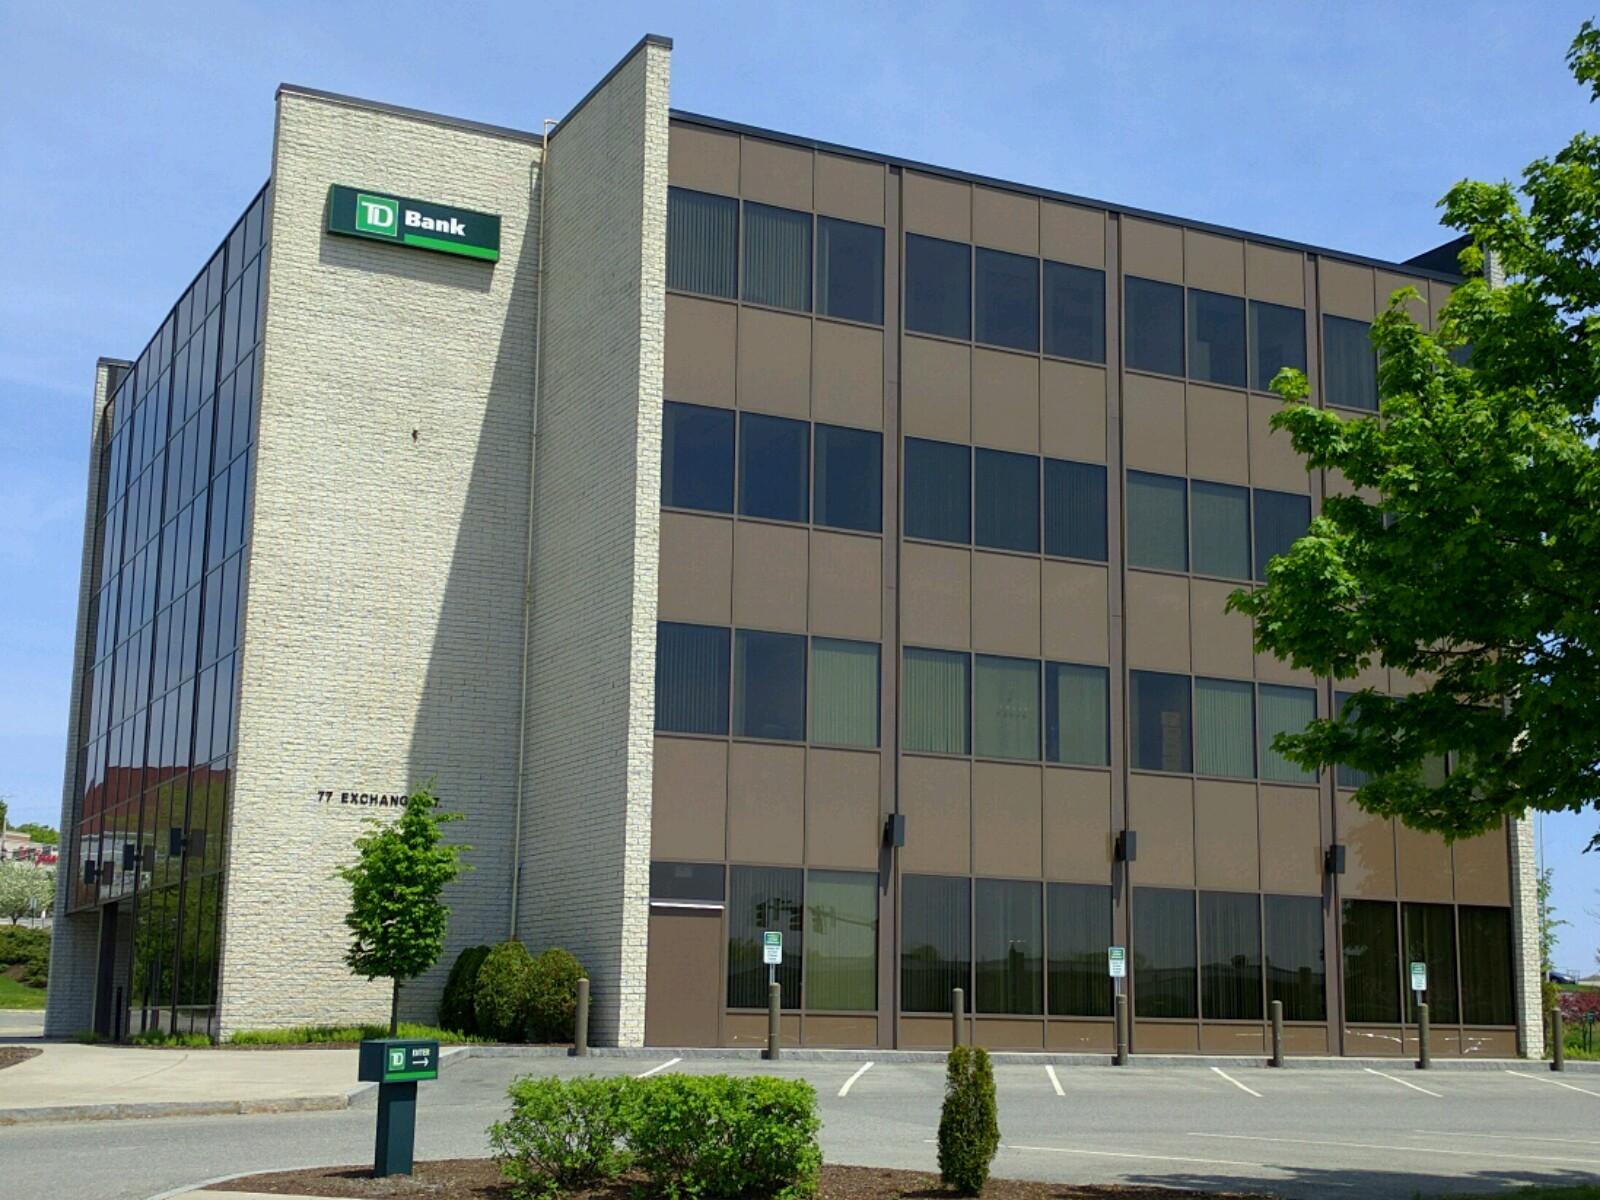 TD Bank branch in Bangor, Maine.